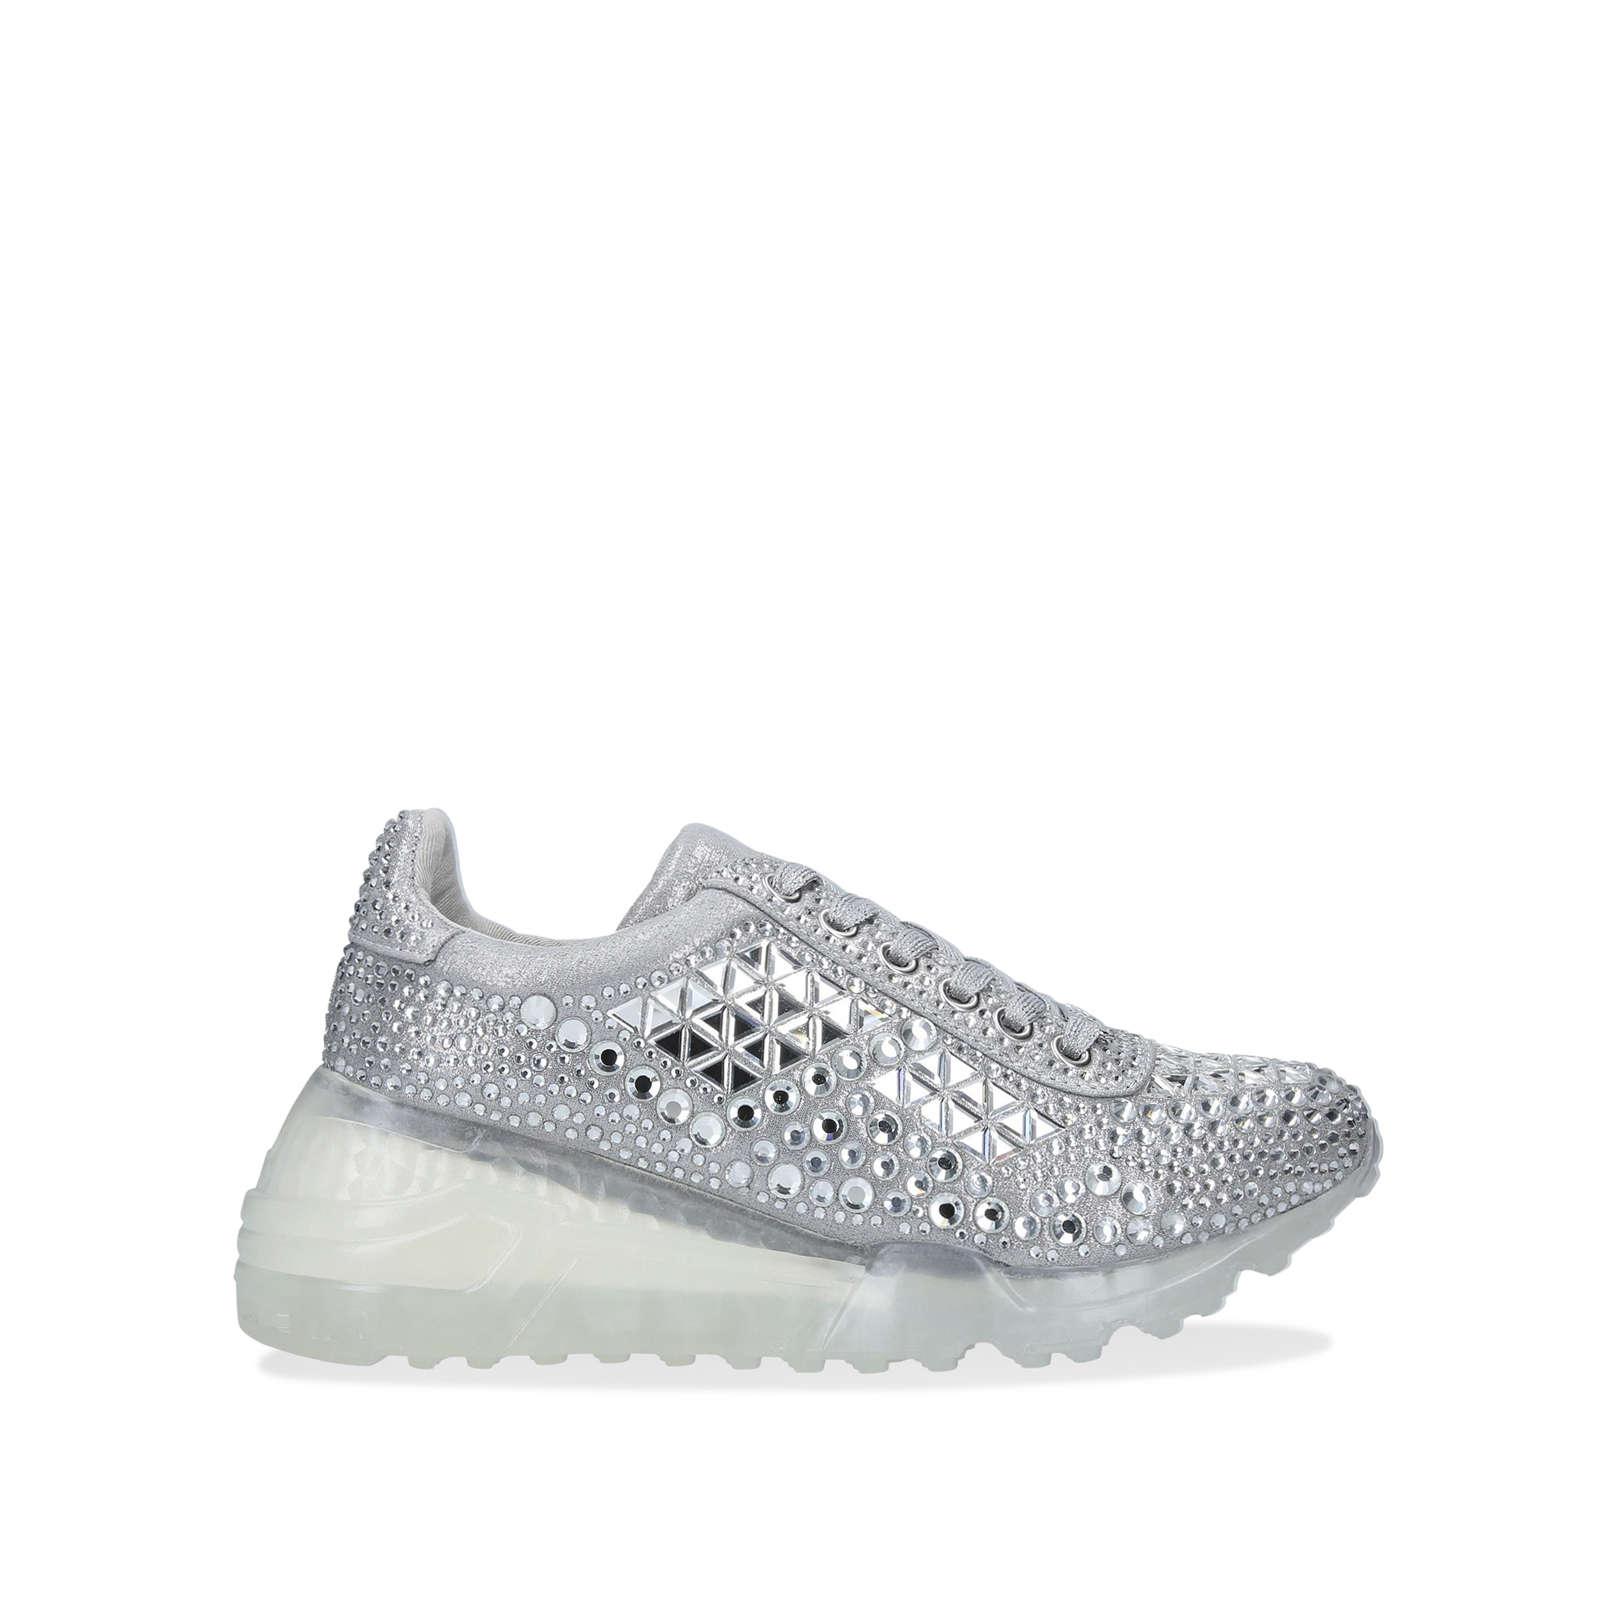 CARISSA - STEVE MADDEN Sneakers